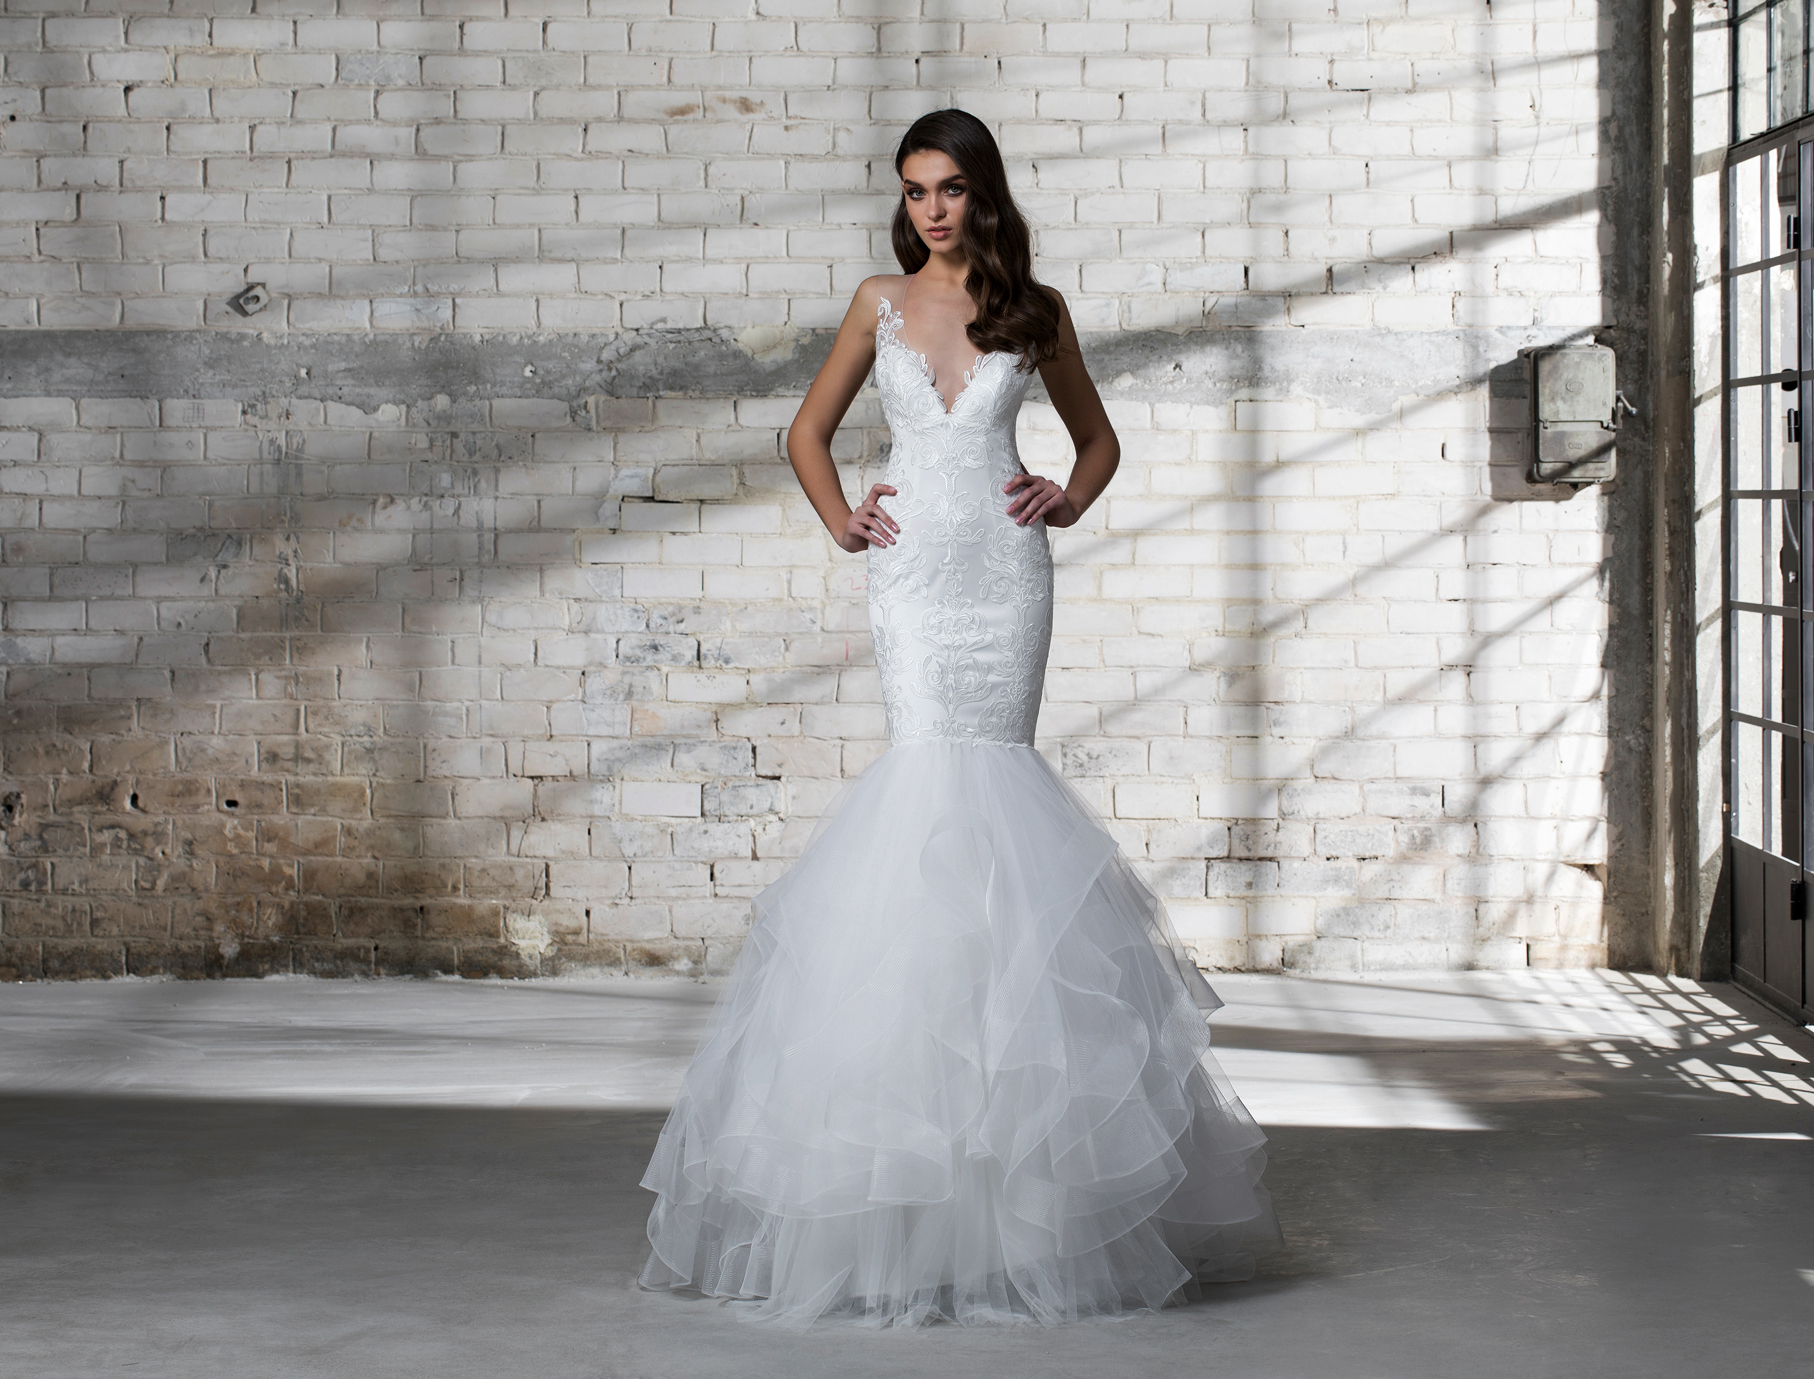 pnina tornai wedding dress spring 2019 mermaid v neck